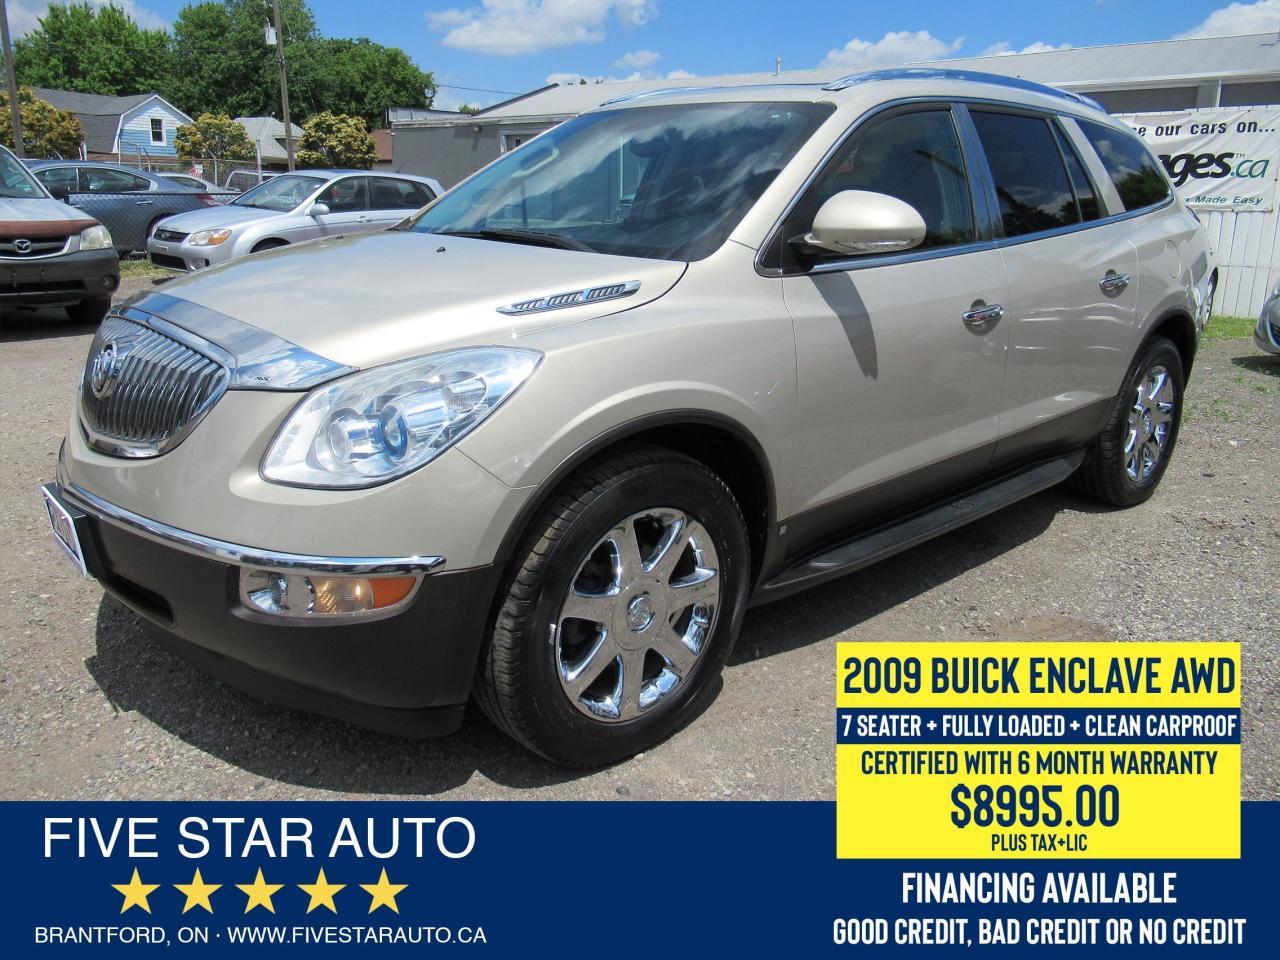 2009 Buick Enclave CXL *Clean Carproof* Certified w/ 6 Month Warranty